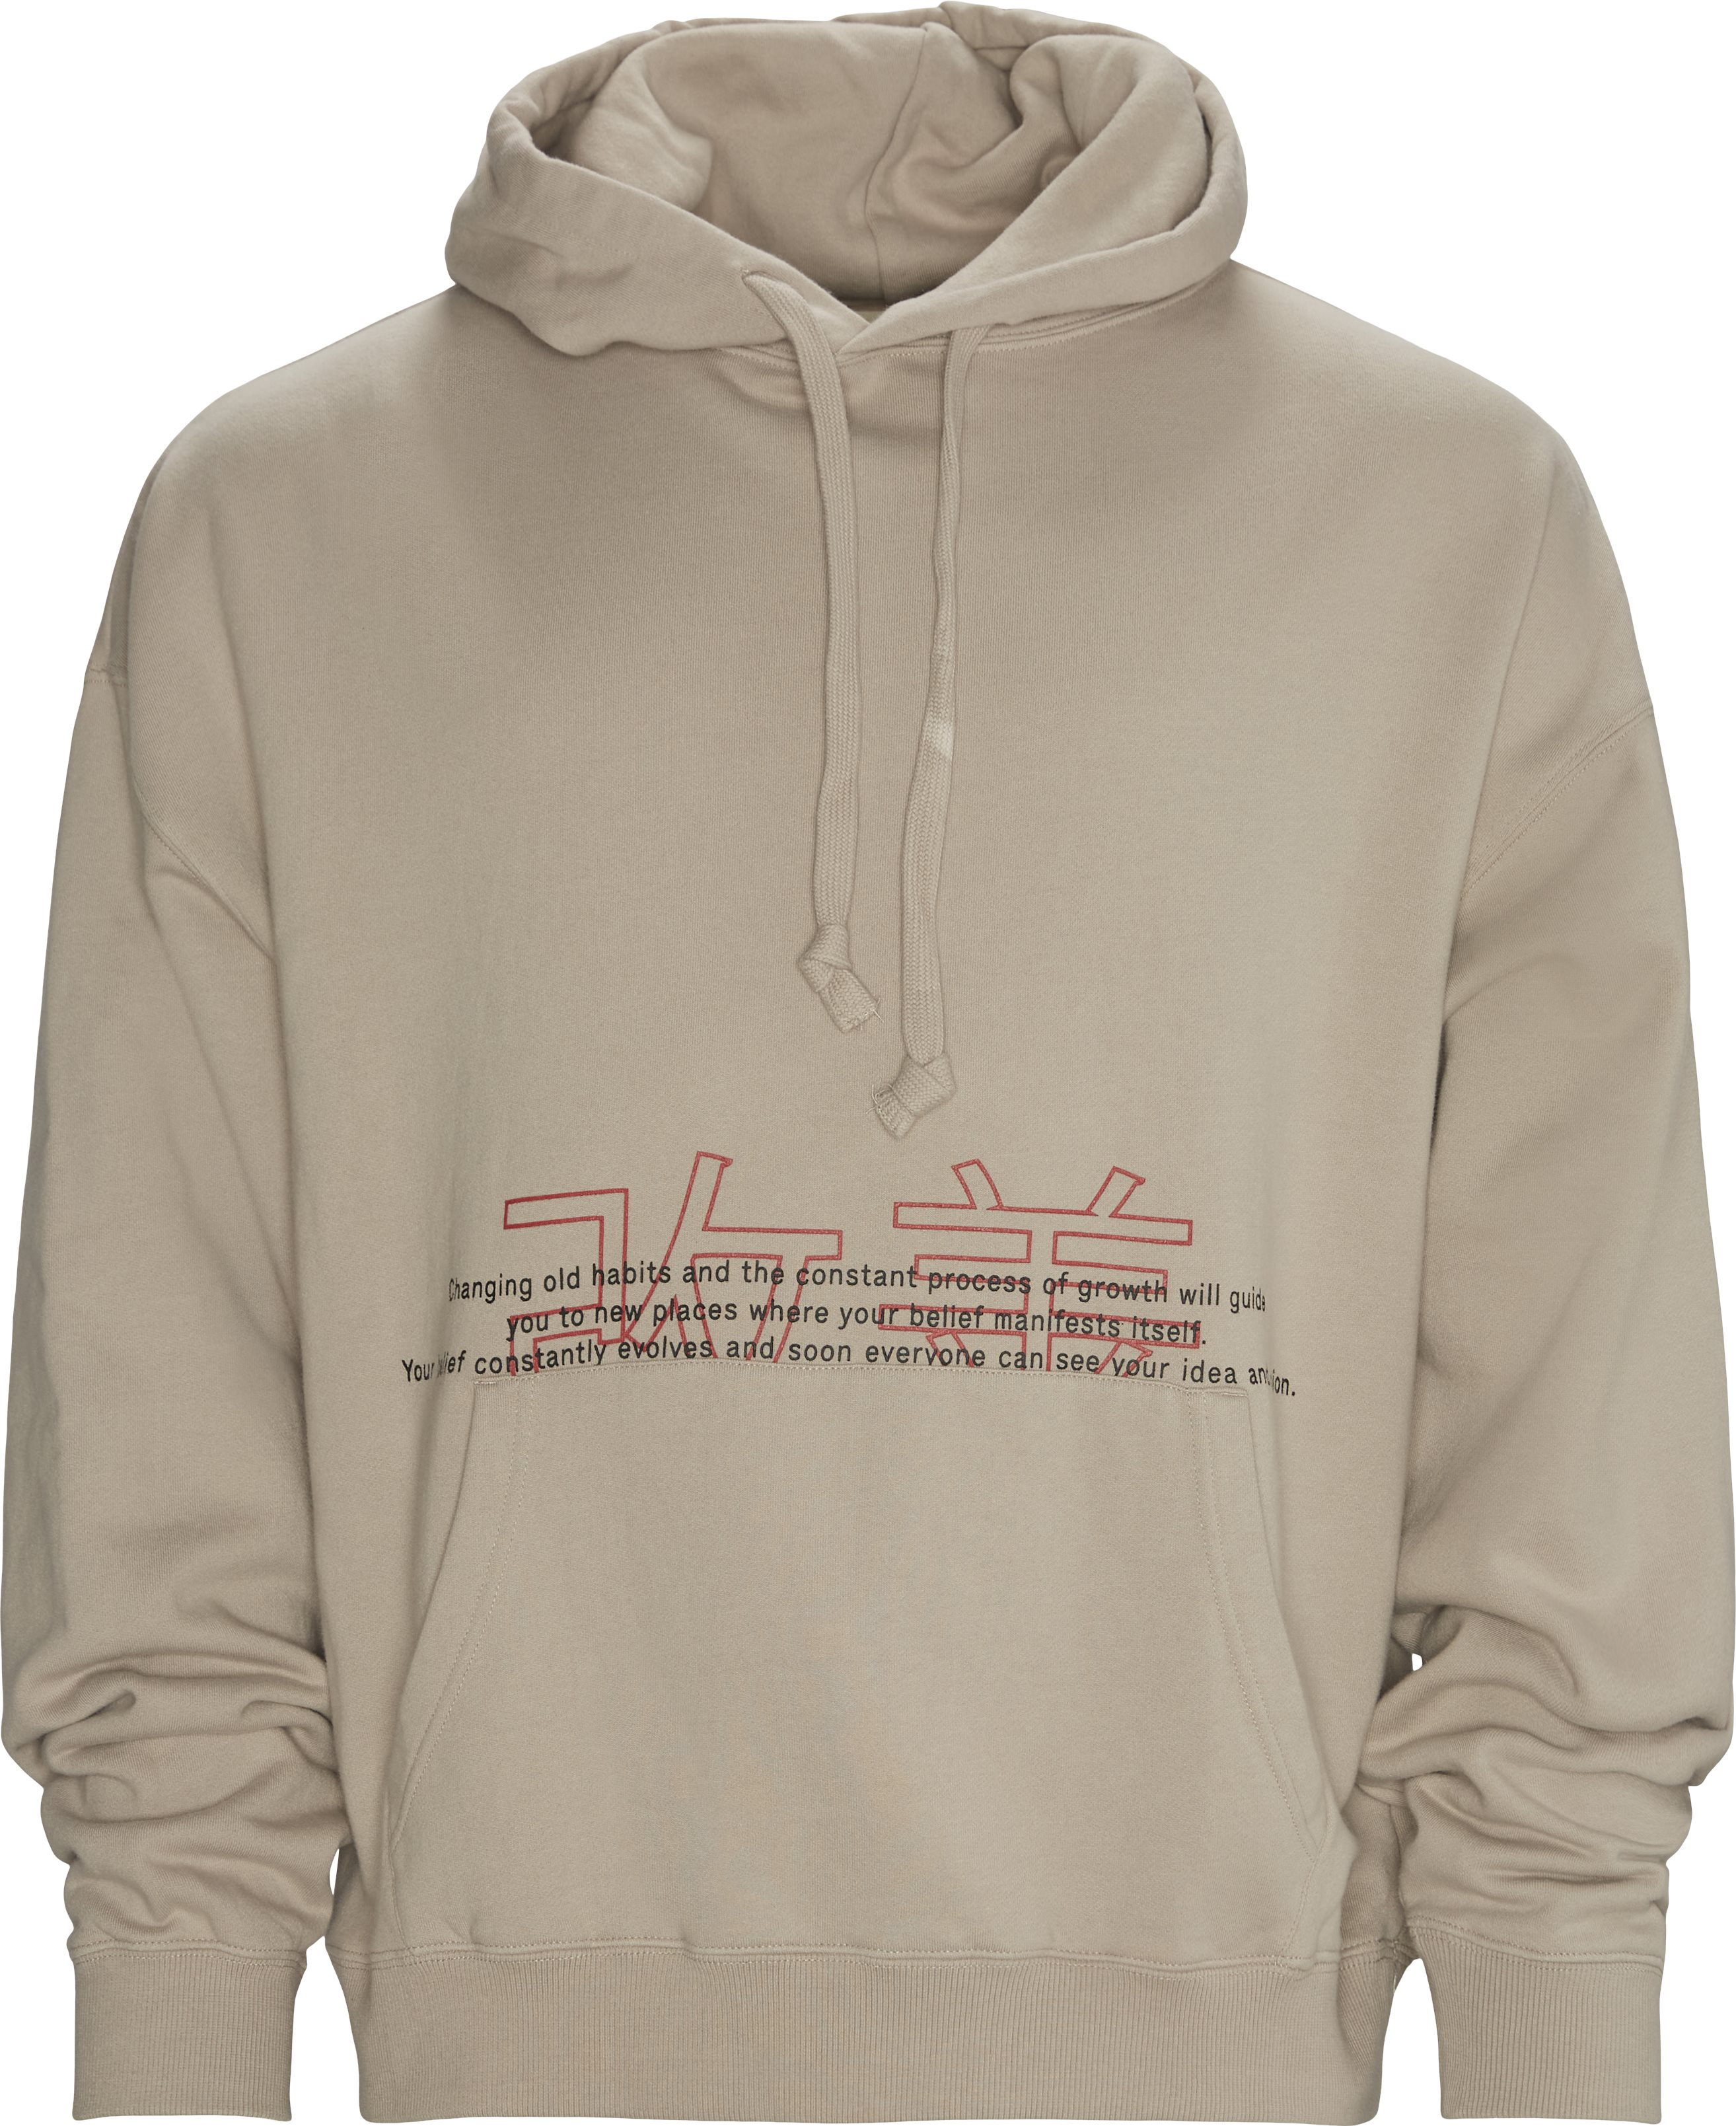 Oversized Kaizen Logo Hoodie - Sweatshirts - Oversized - Sand